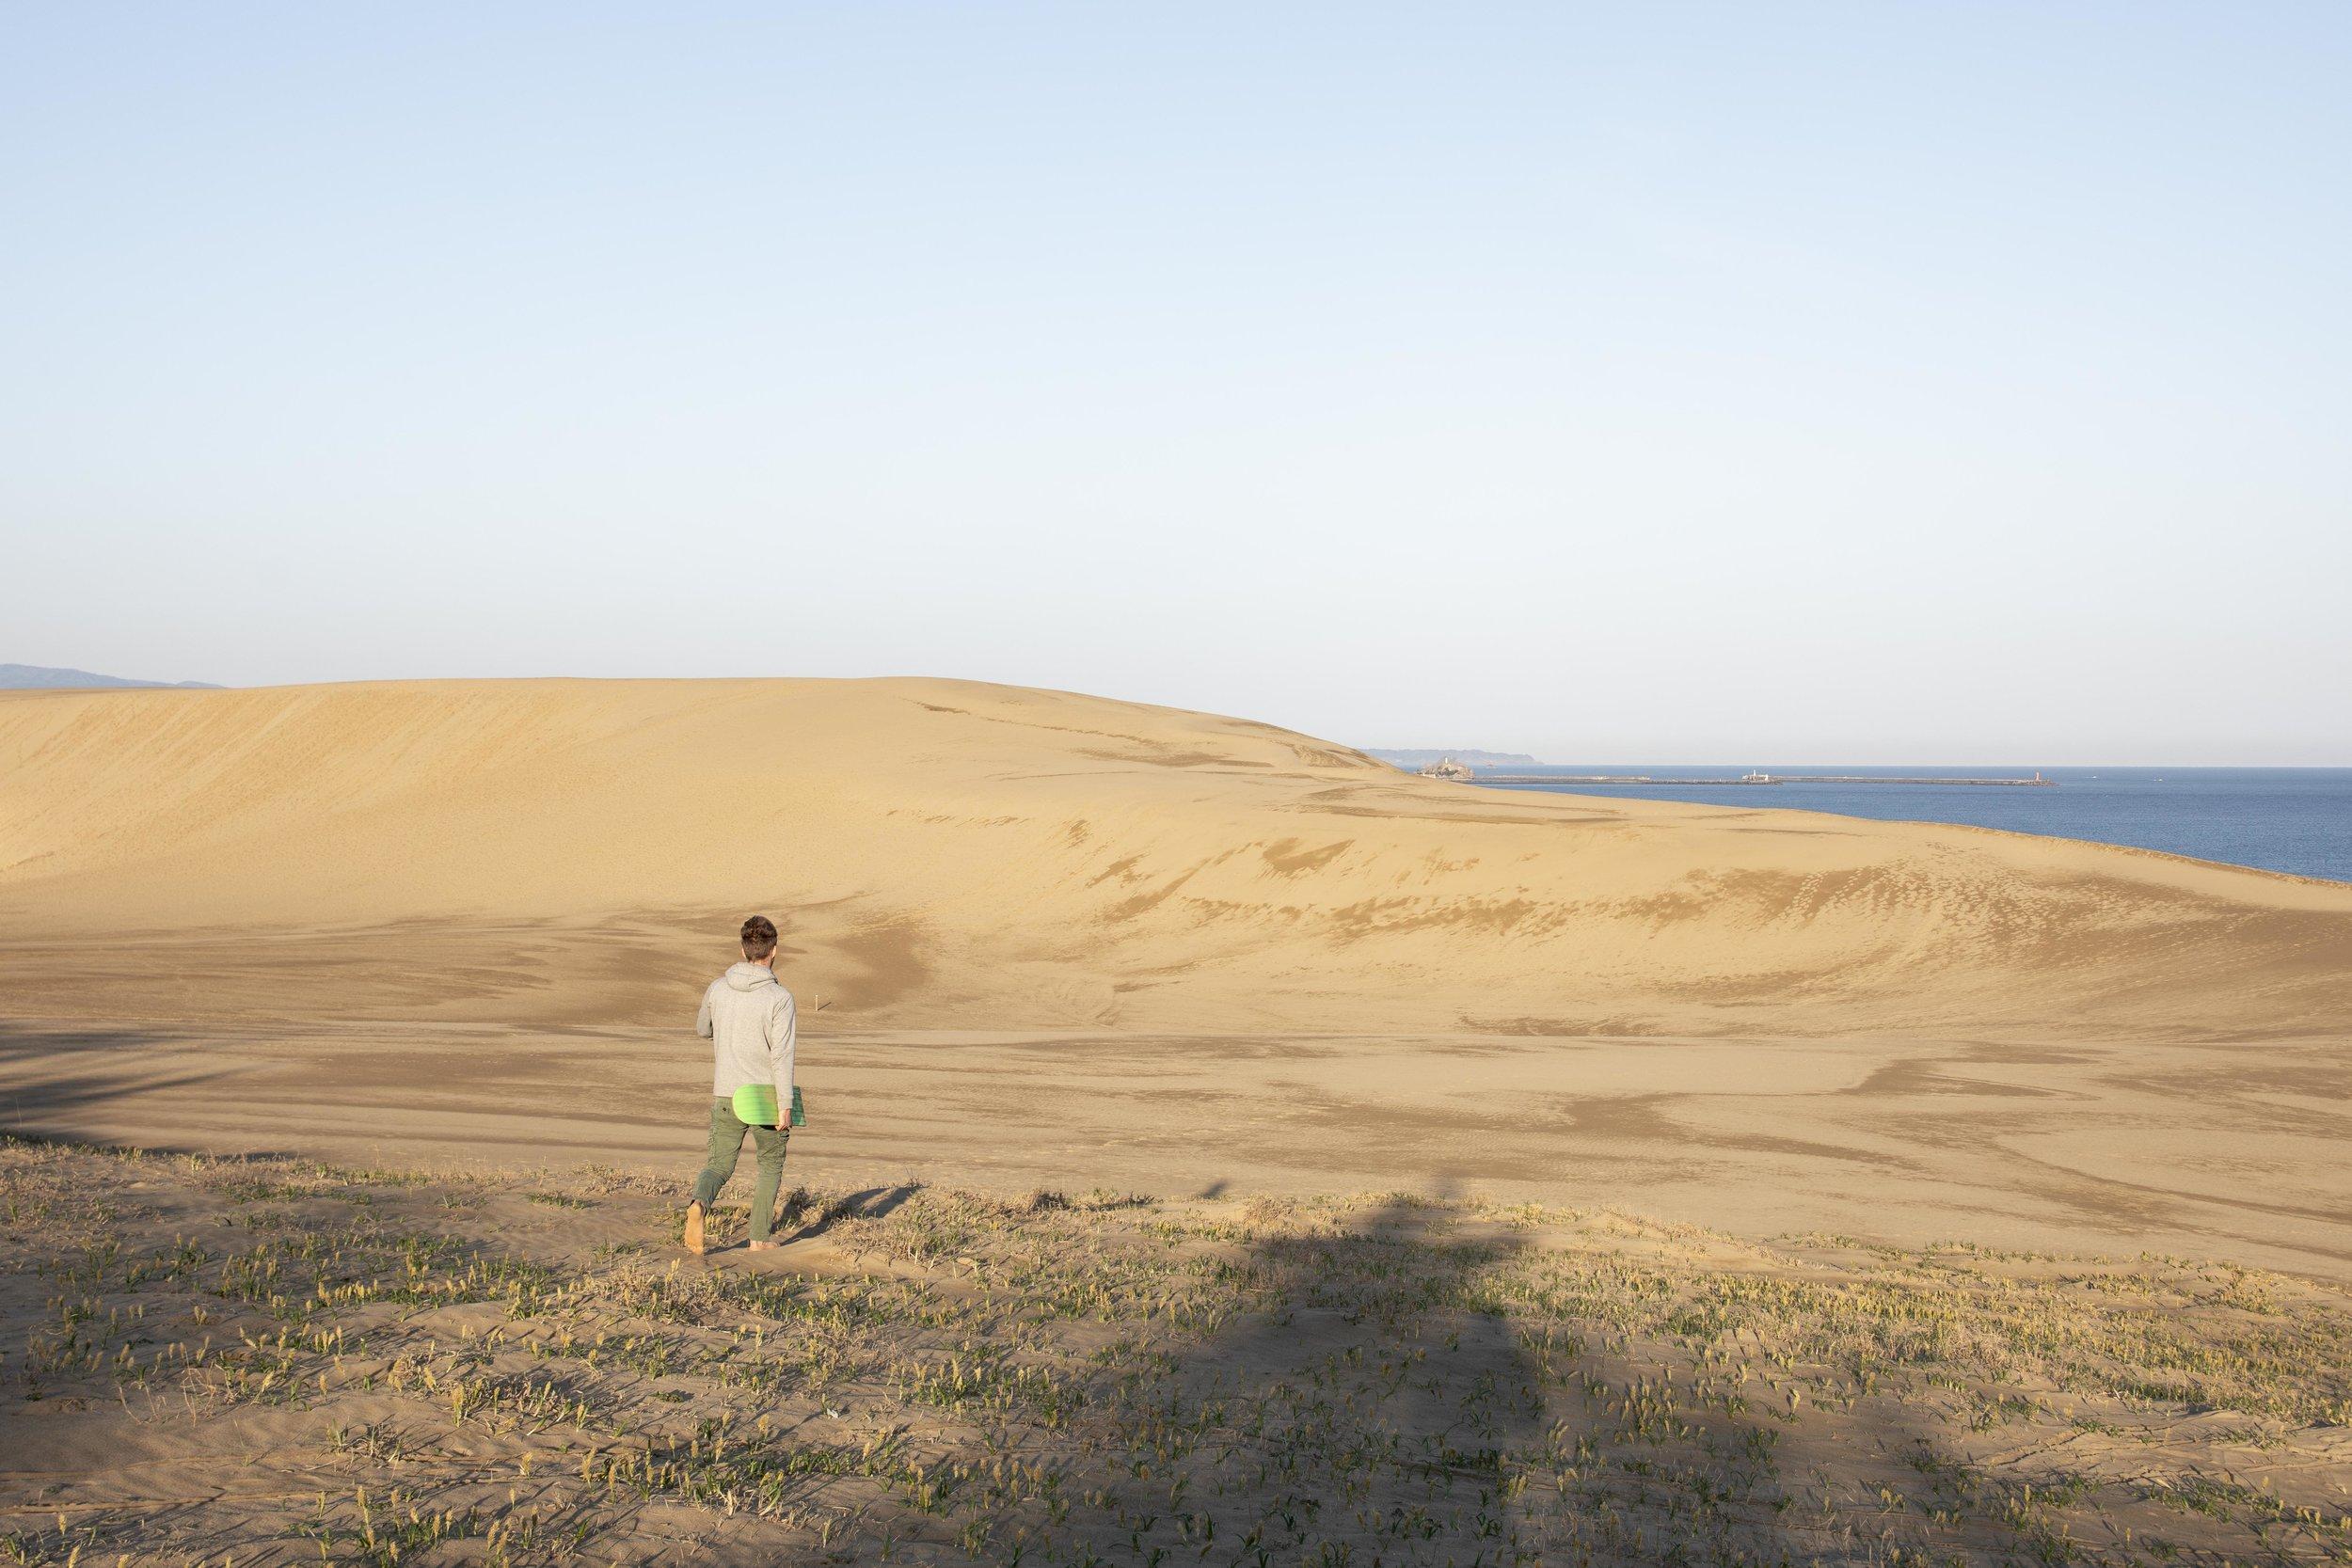 Sandboarding in Tottori